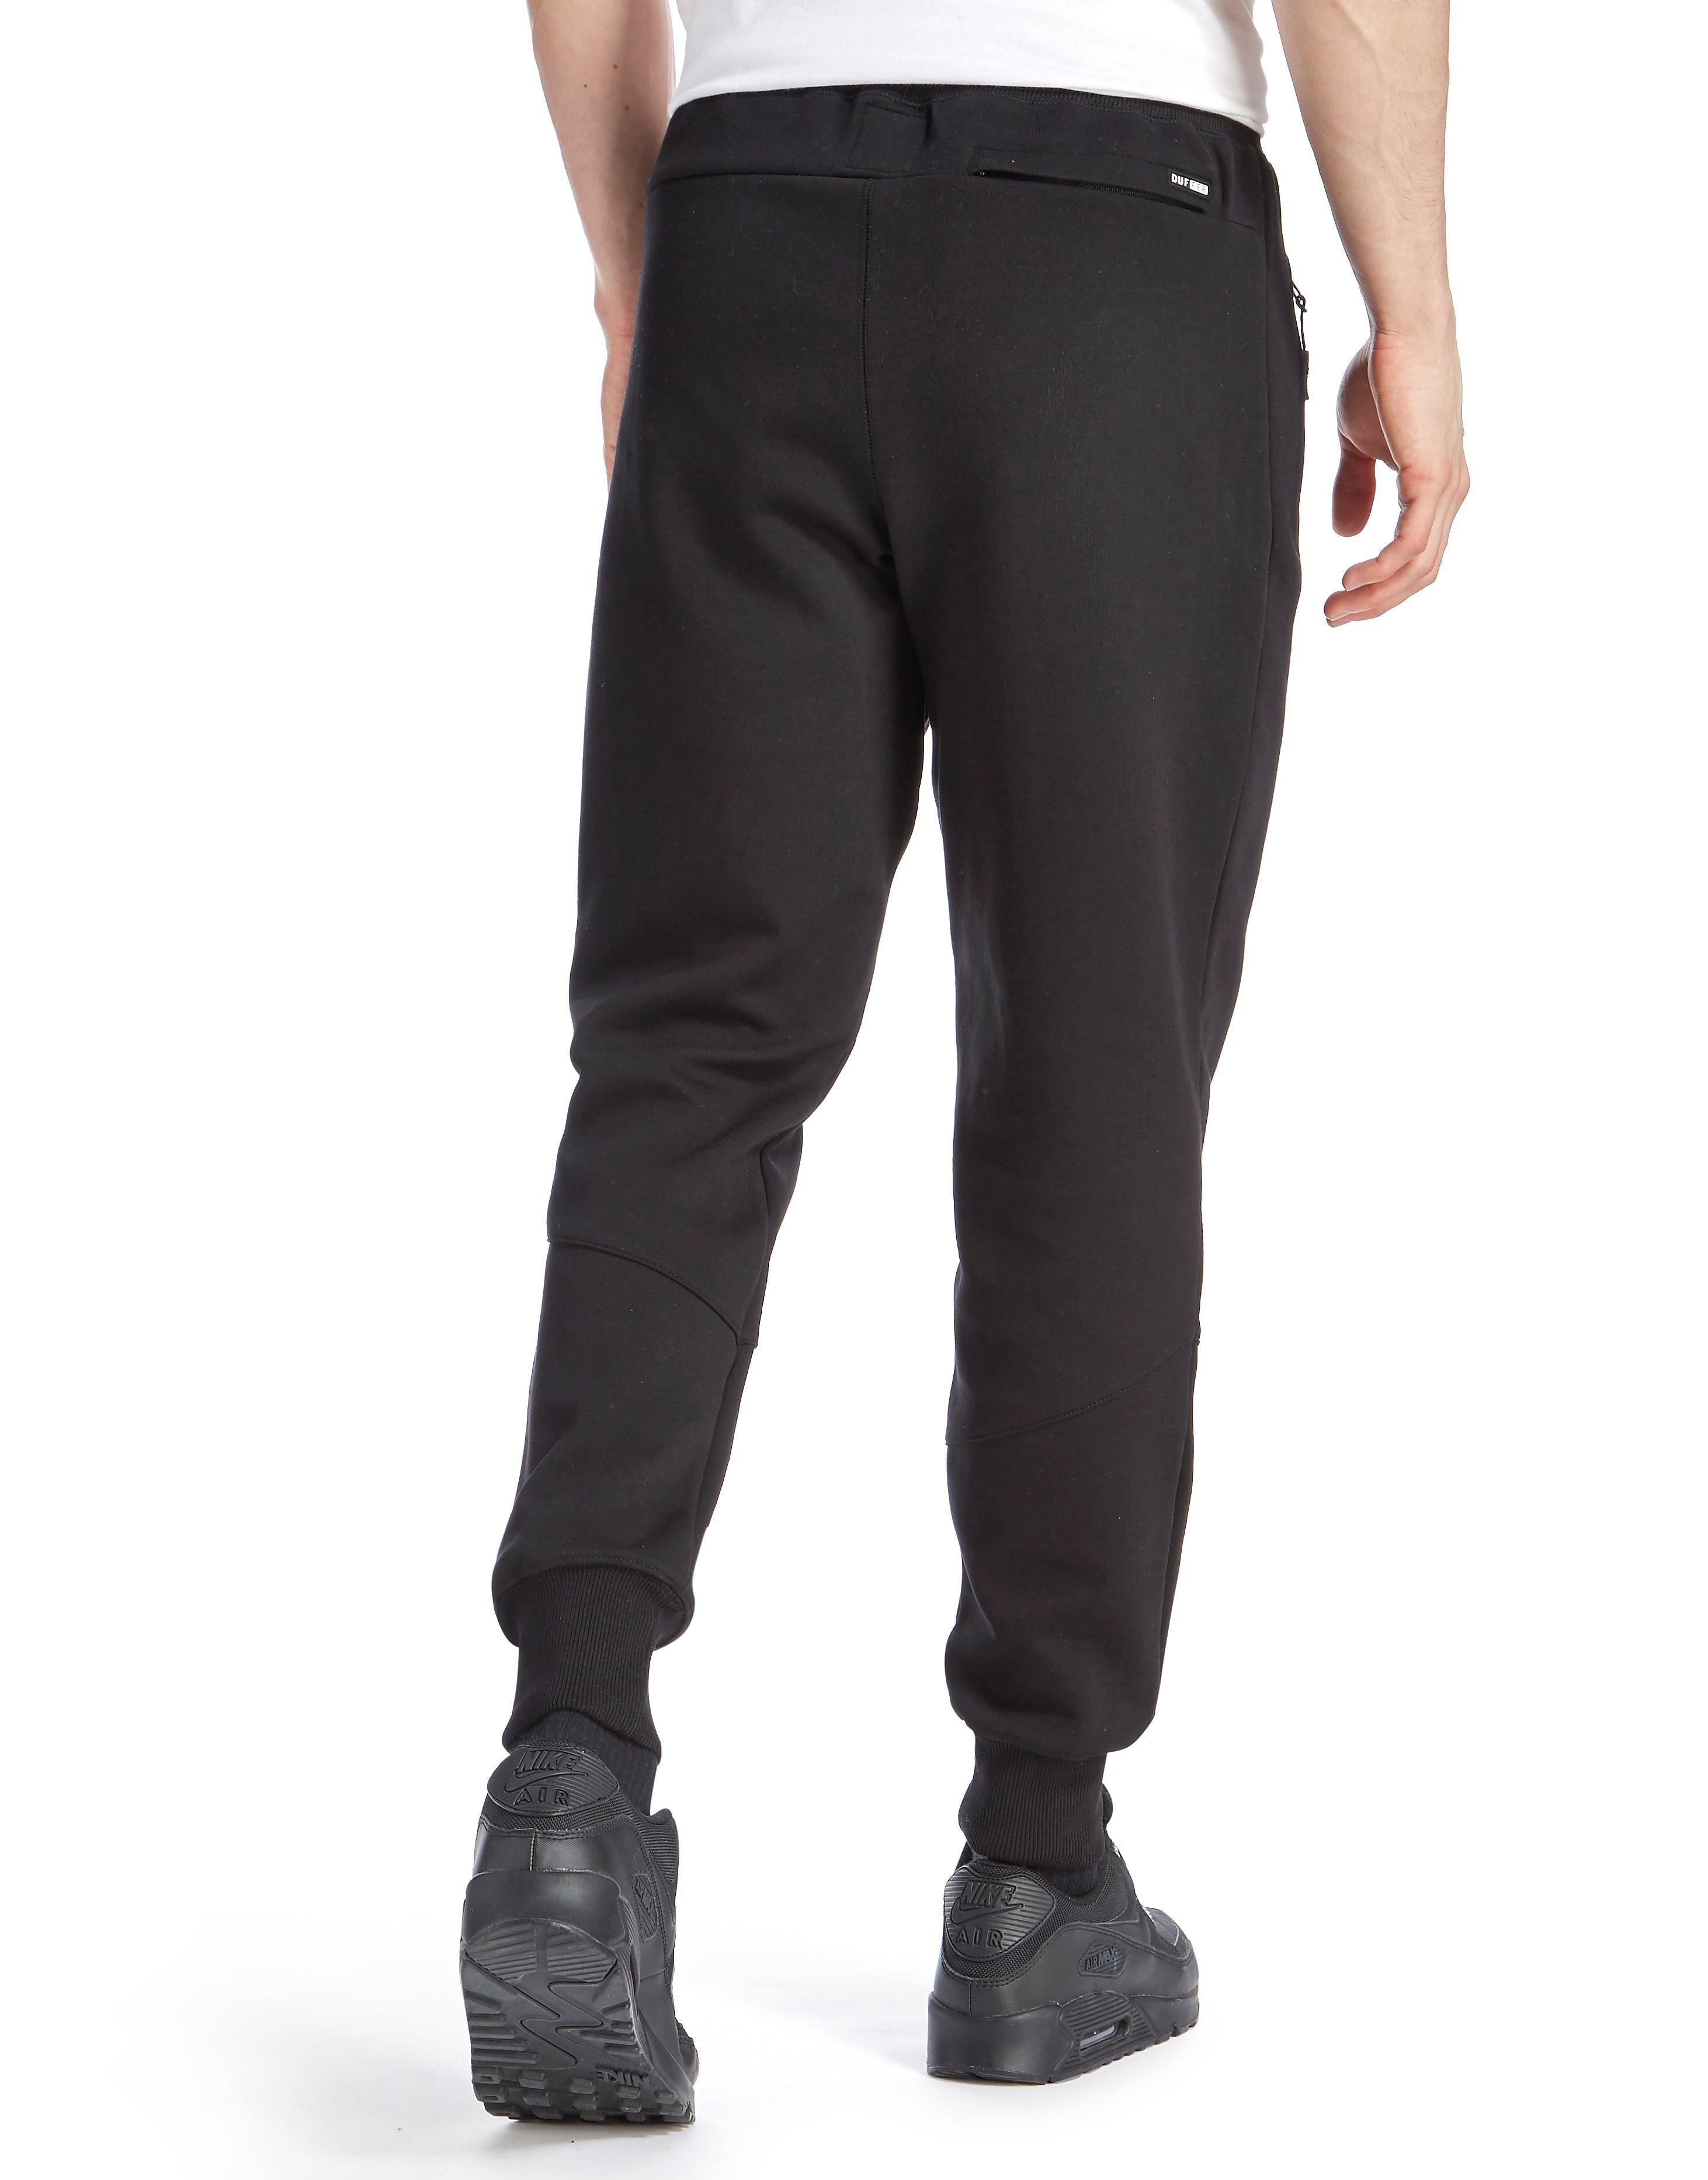 Duffer of St George Black Label Sigma Jogging Pants